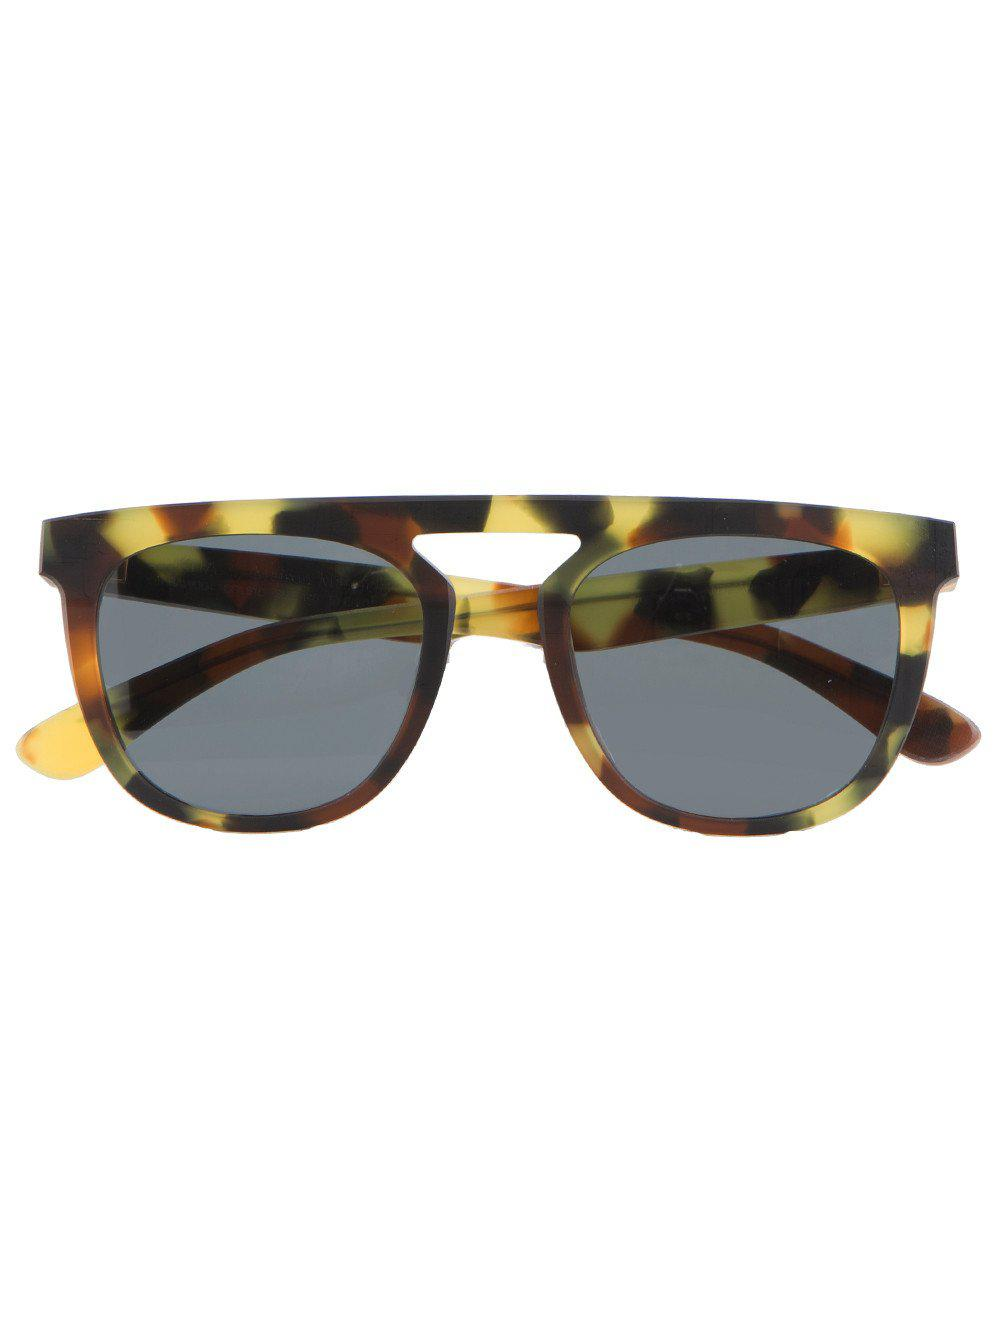 ad884e5fad Mykita. Women s + Maison Martin Margiela - Raw Sunglasses